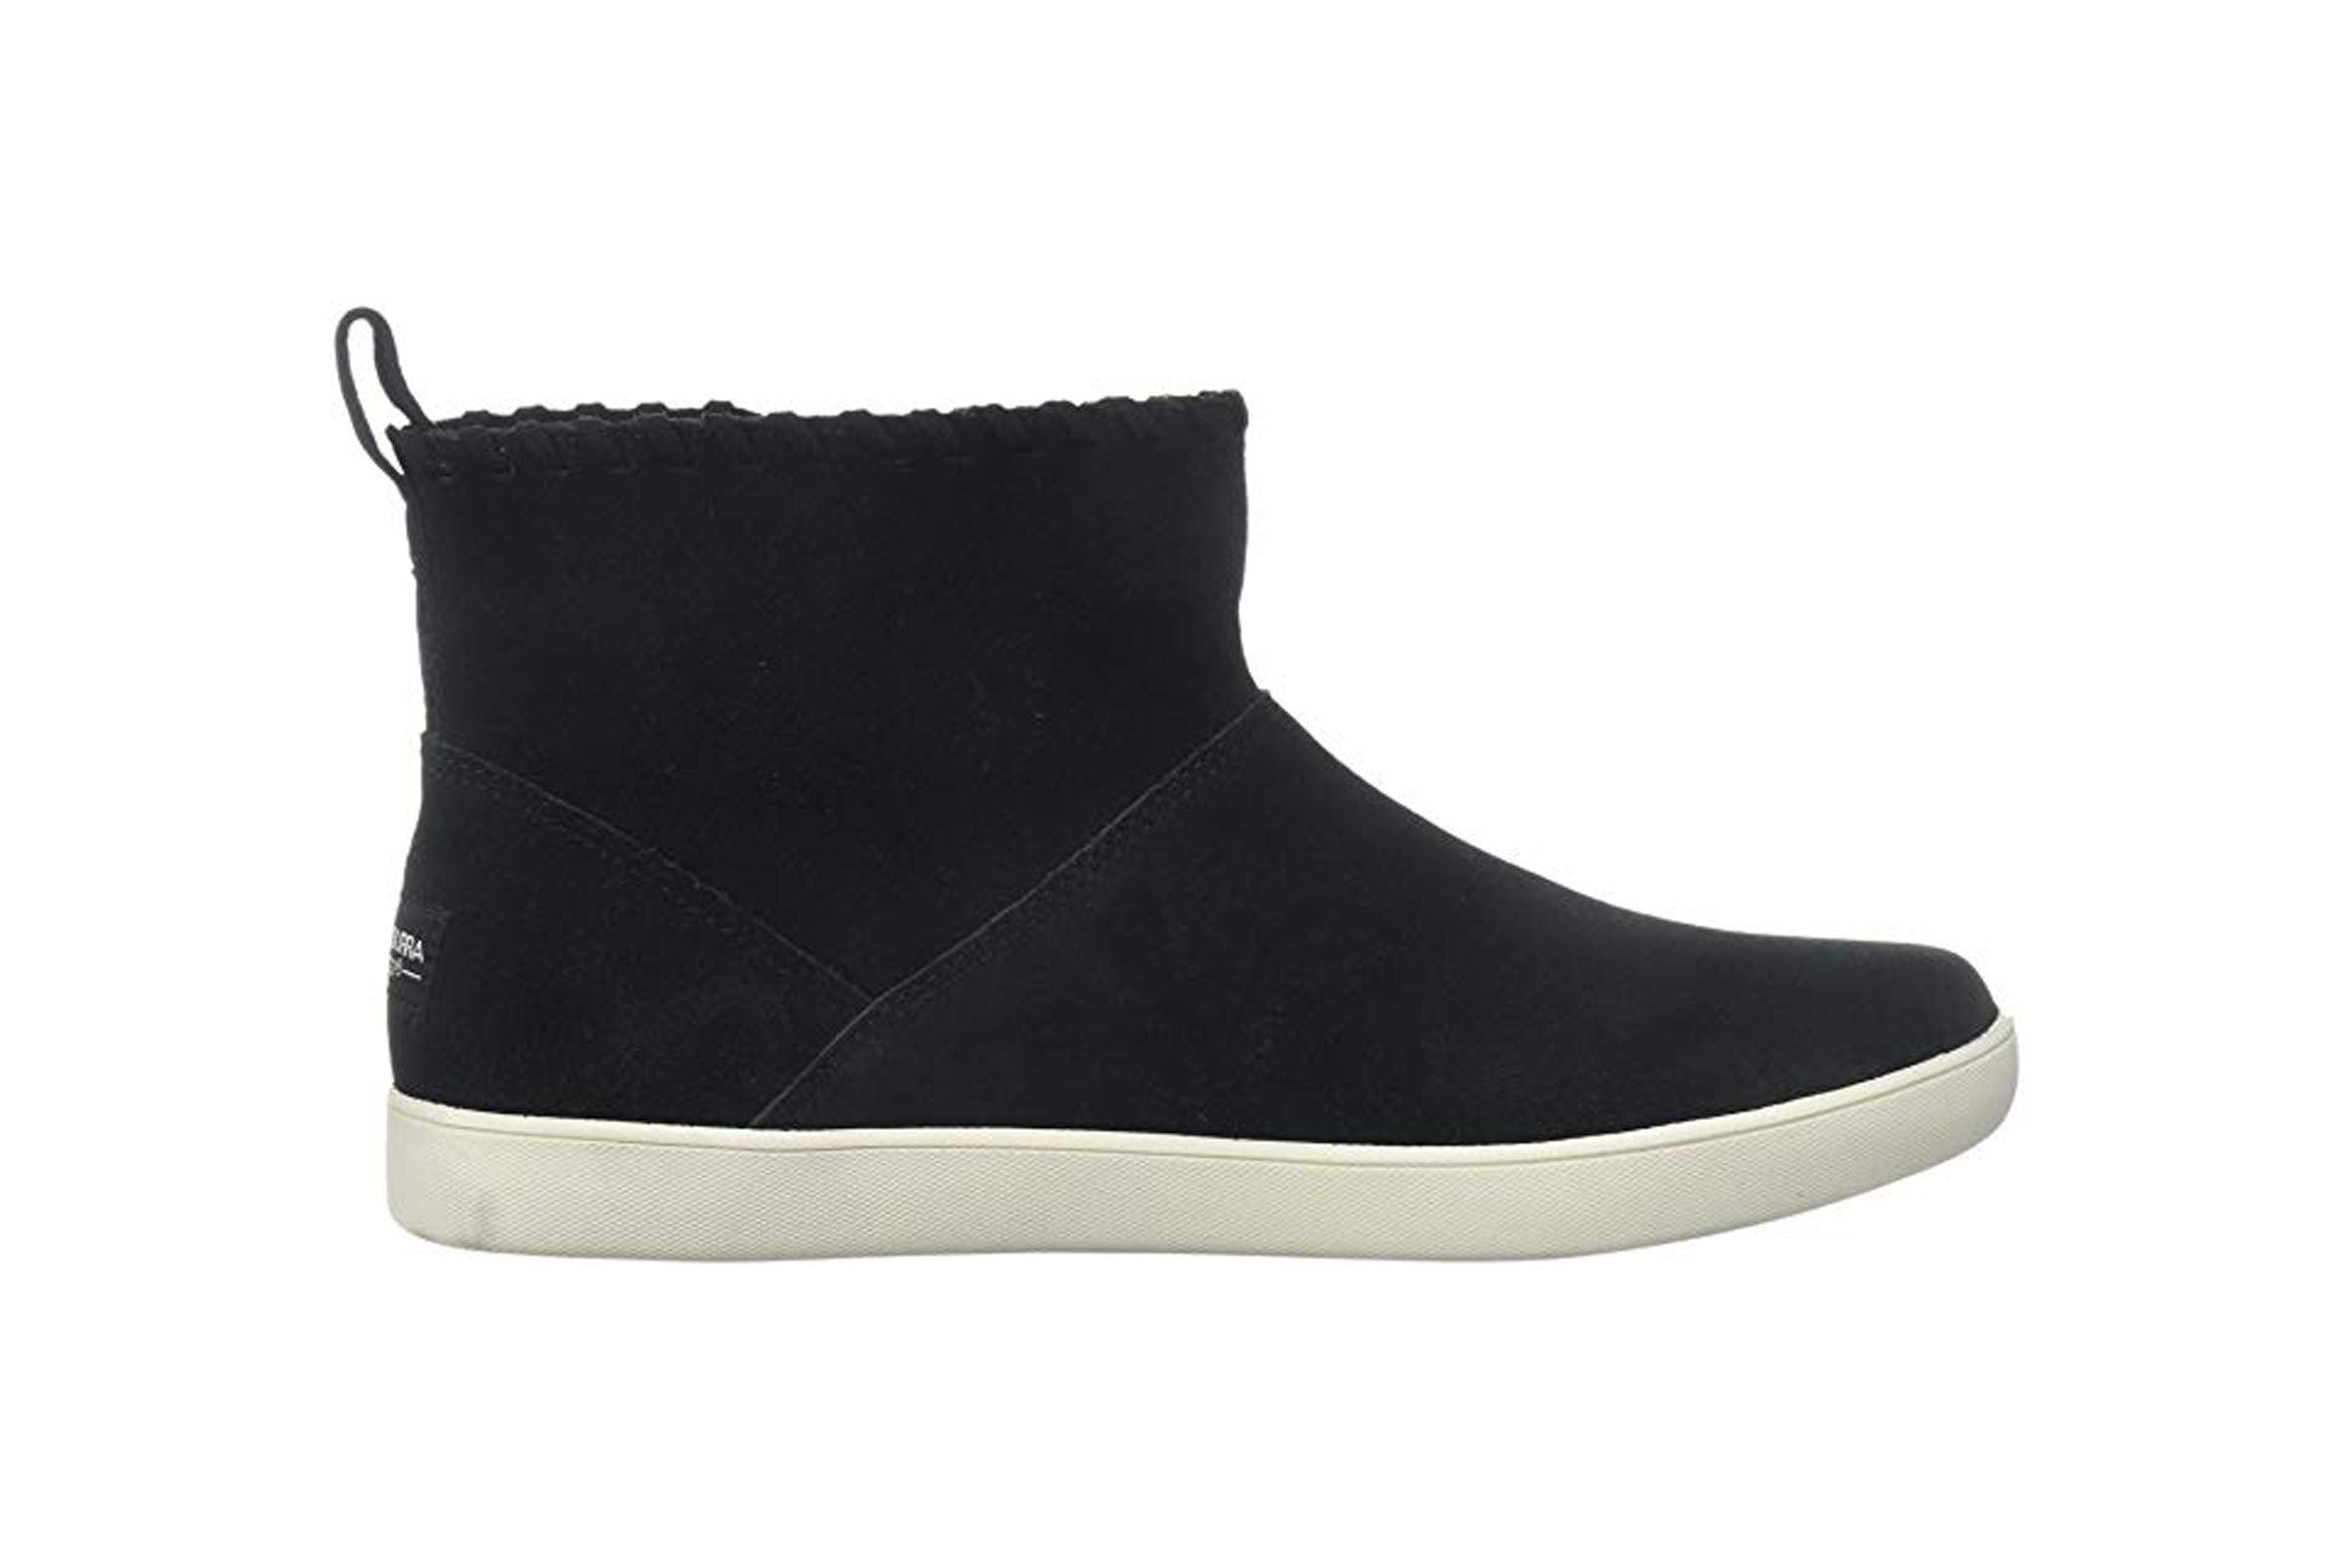 Koolaburra by UGG Women's W Rylee Fashion Boot Black 8 Medium US